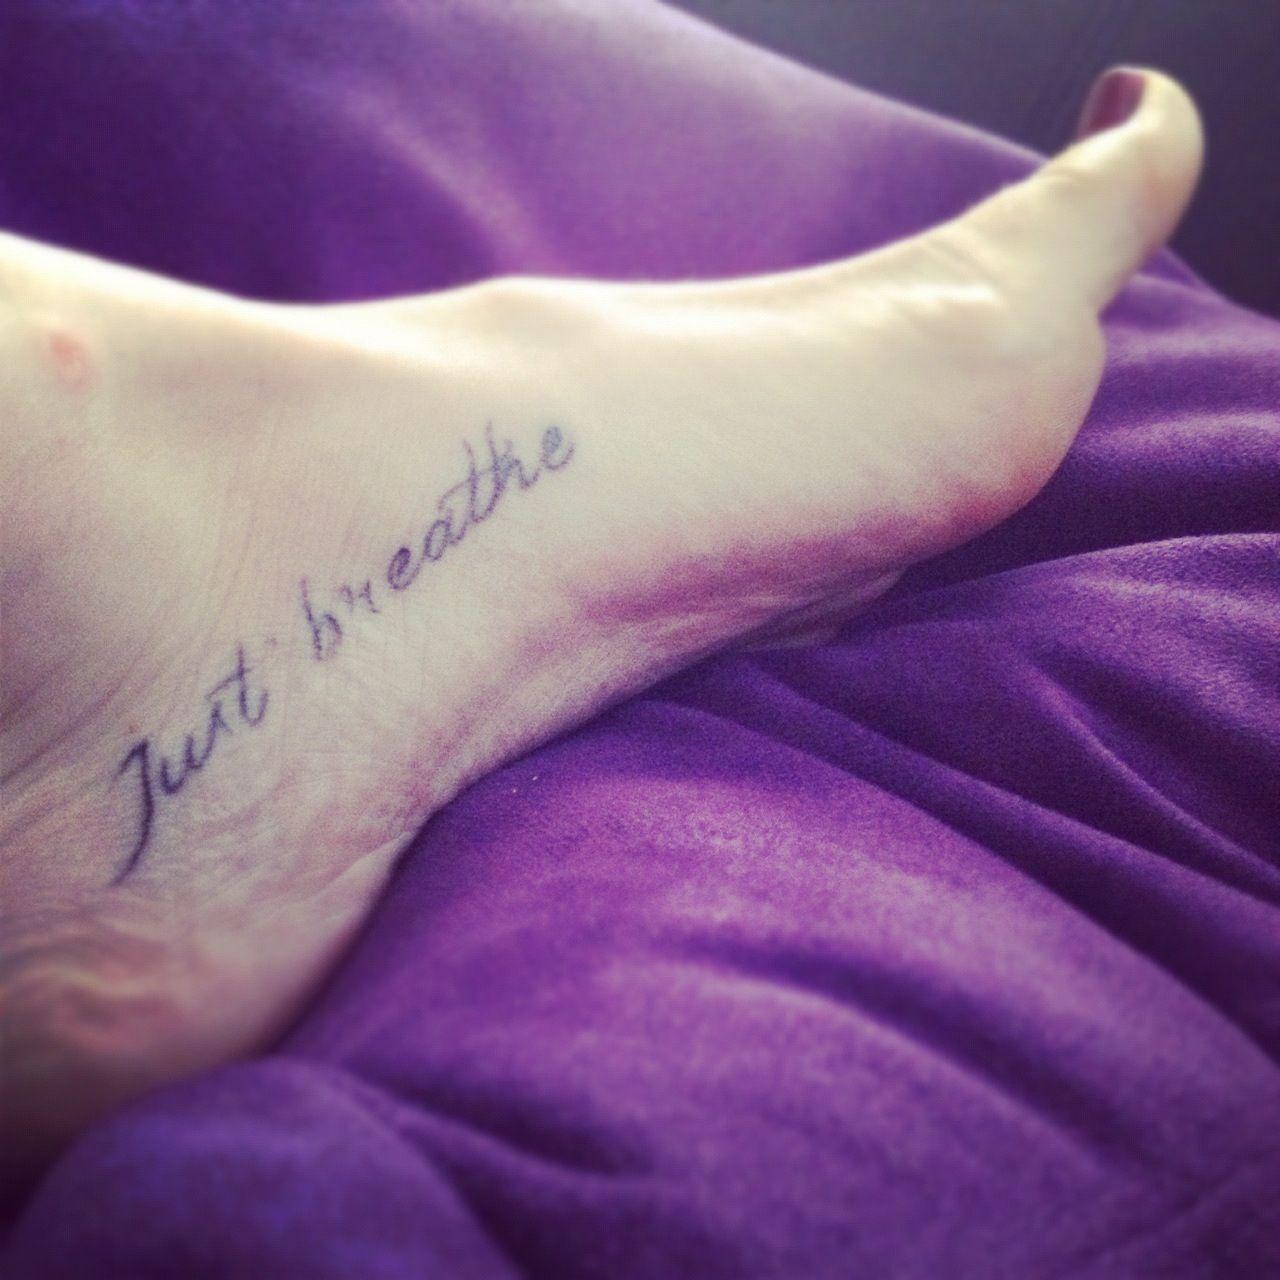 just breathefoot tattoo words pinterest tattoo